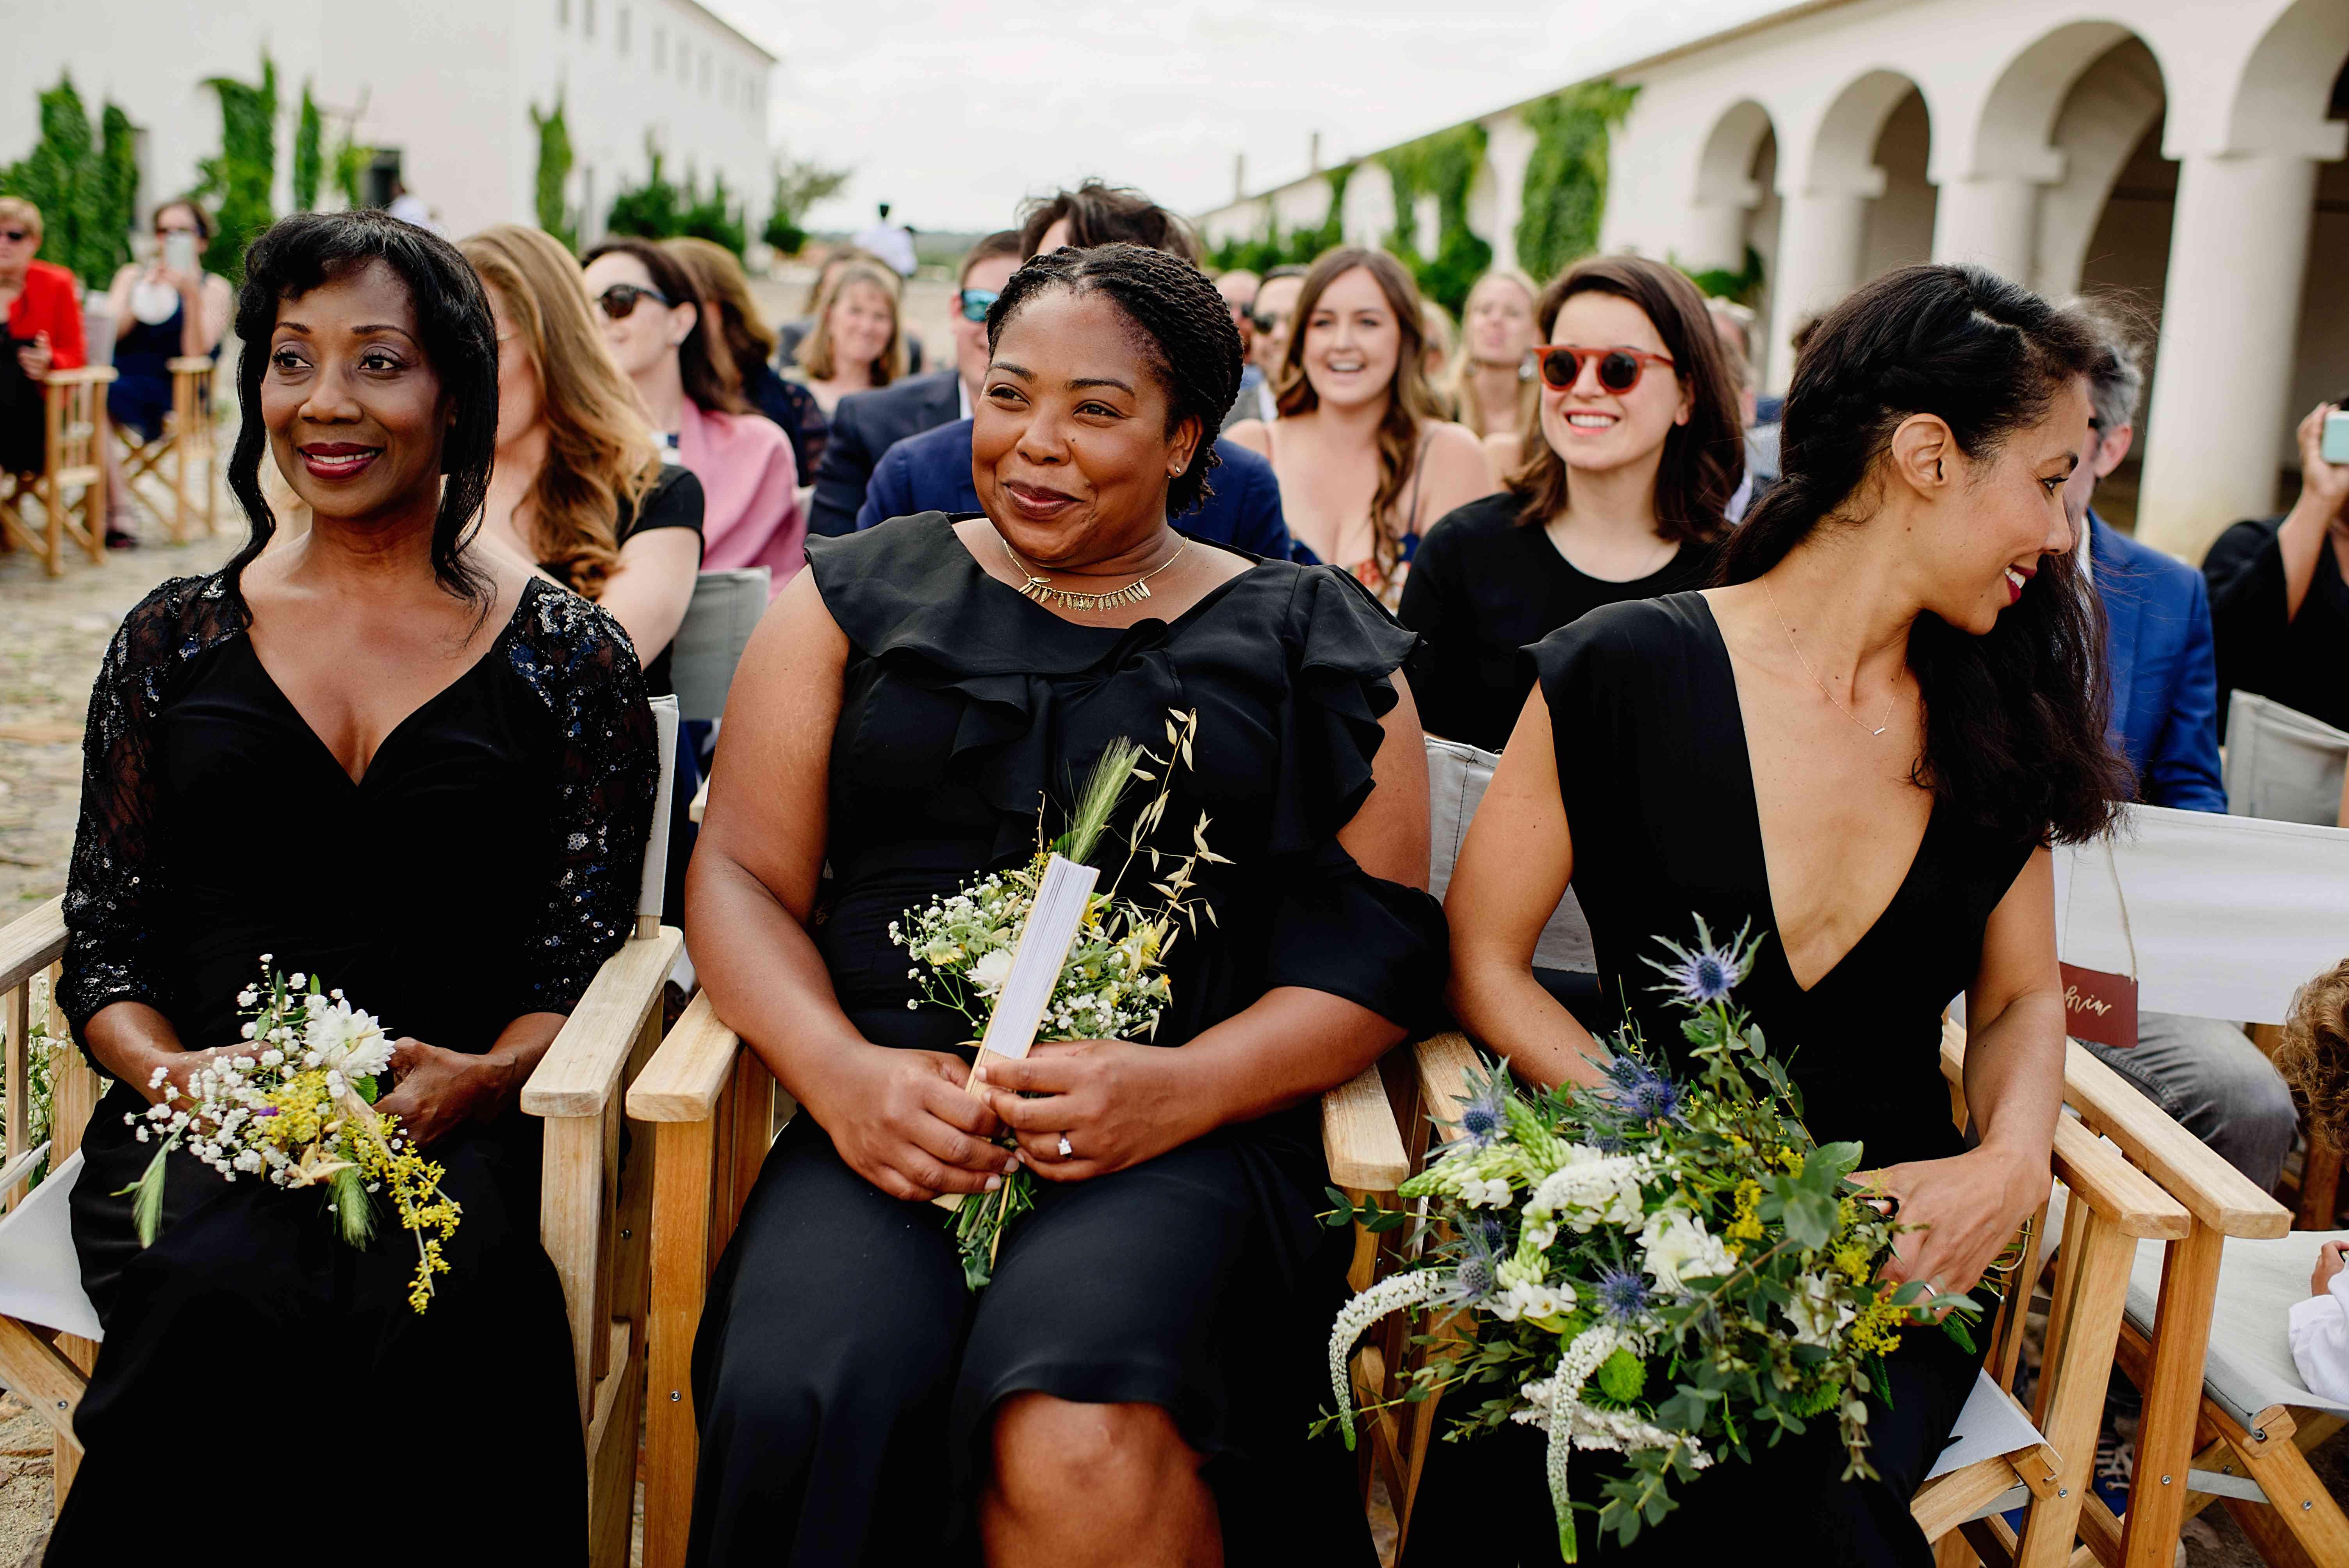 <p>Bridesmaids at ceremony</p><br><br>